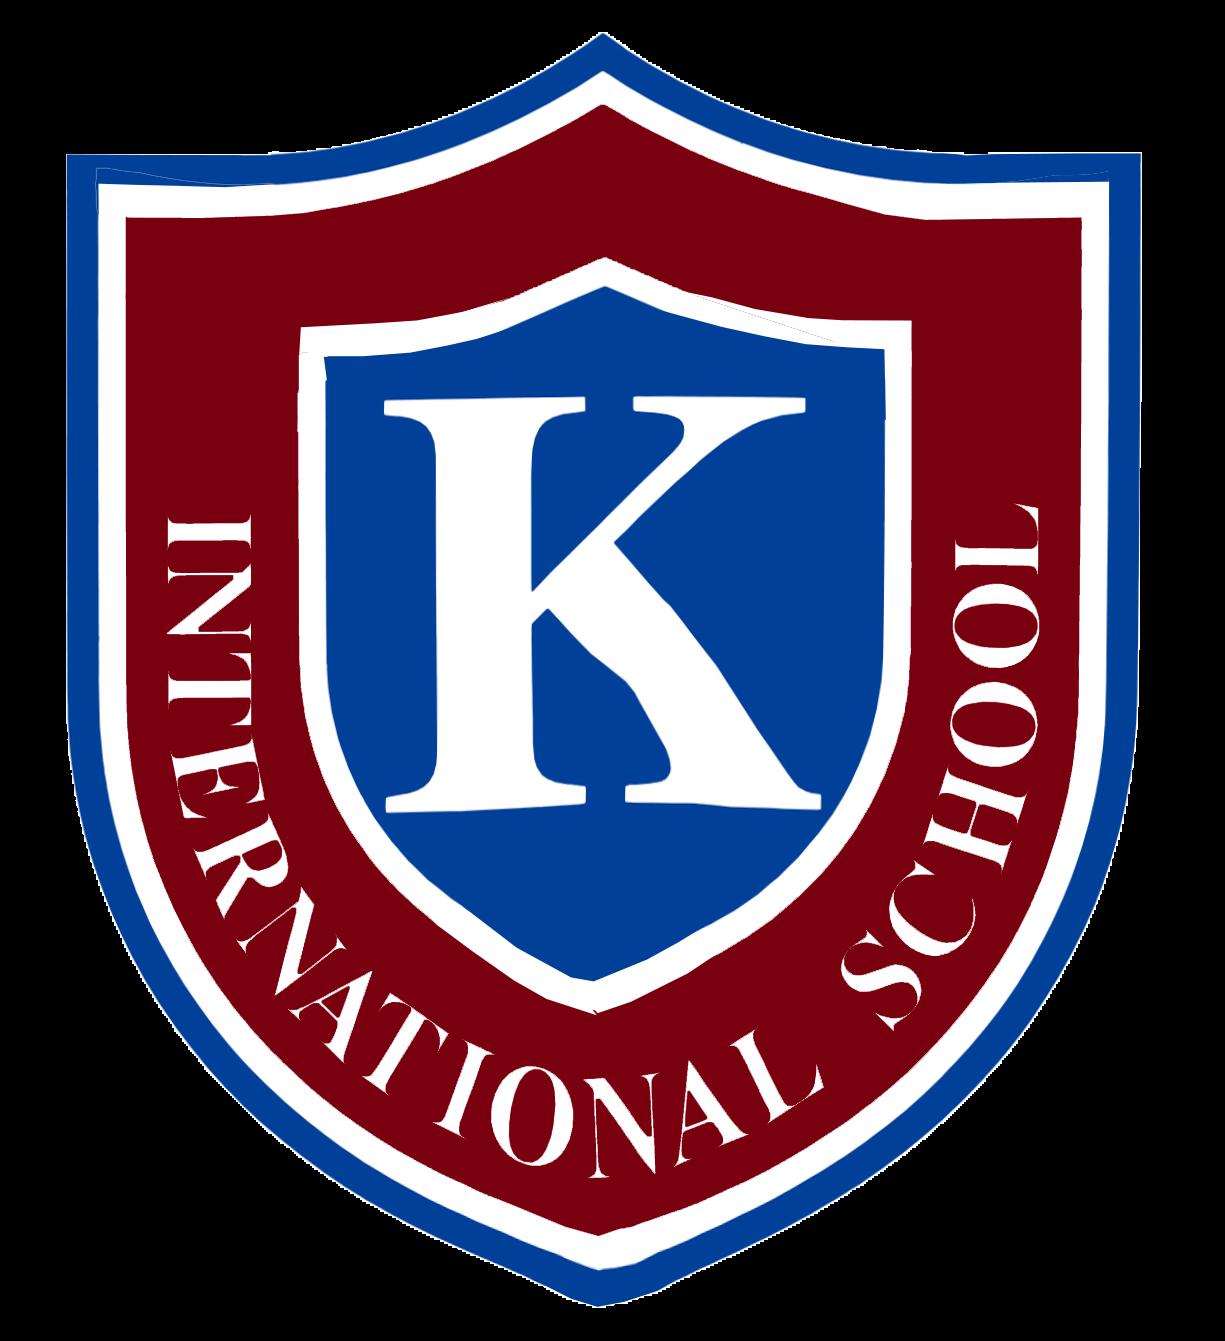 kist-logo-4-updated-totc.png